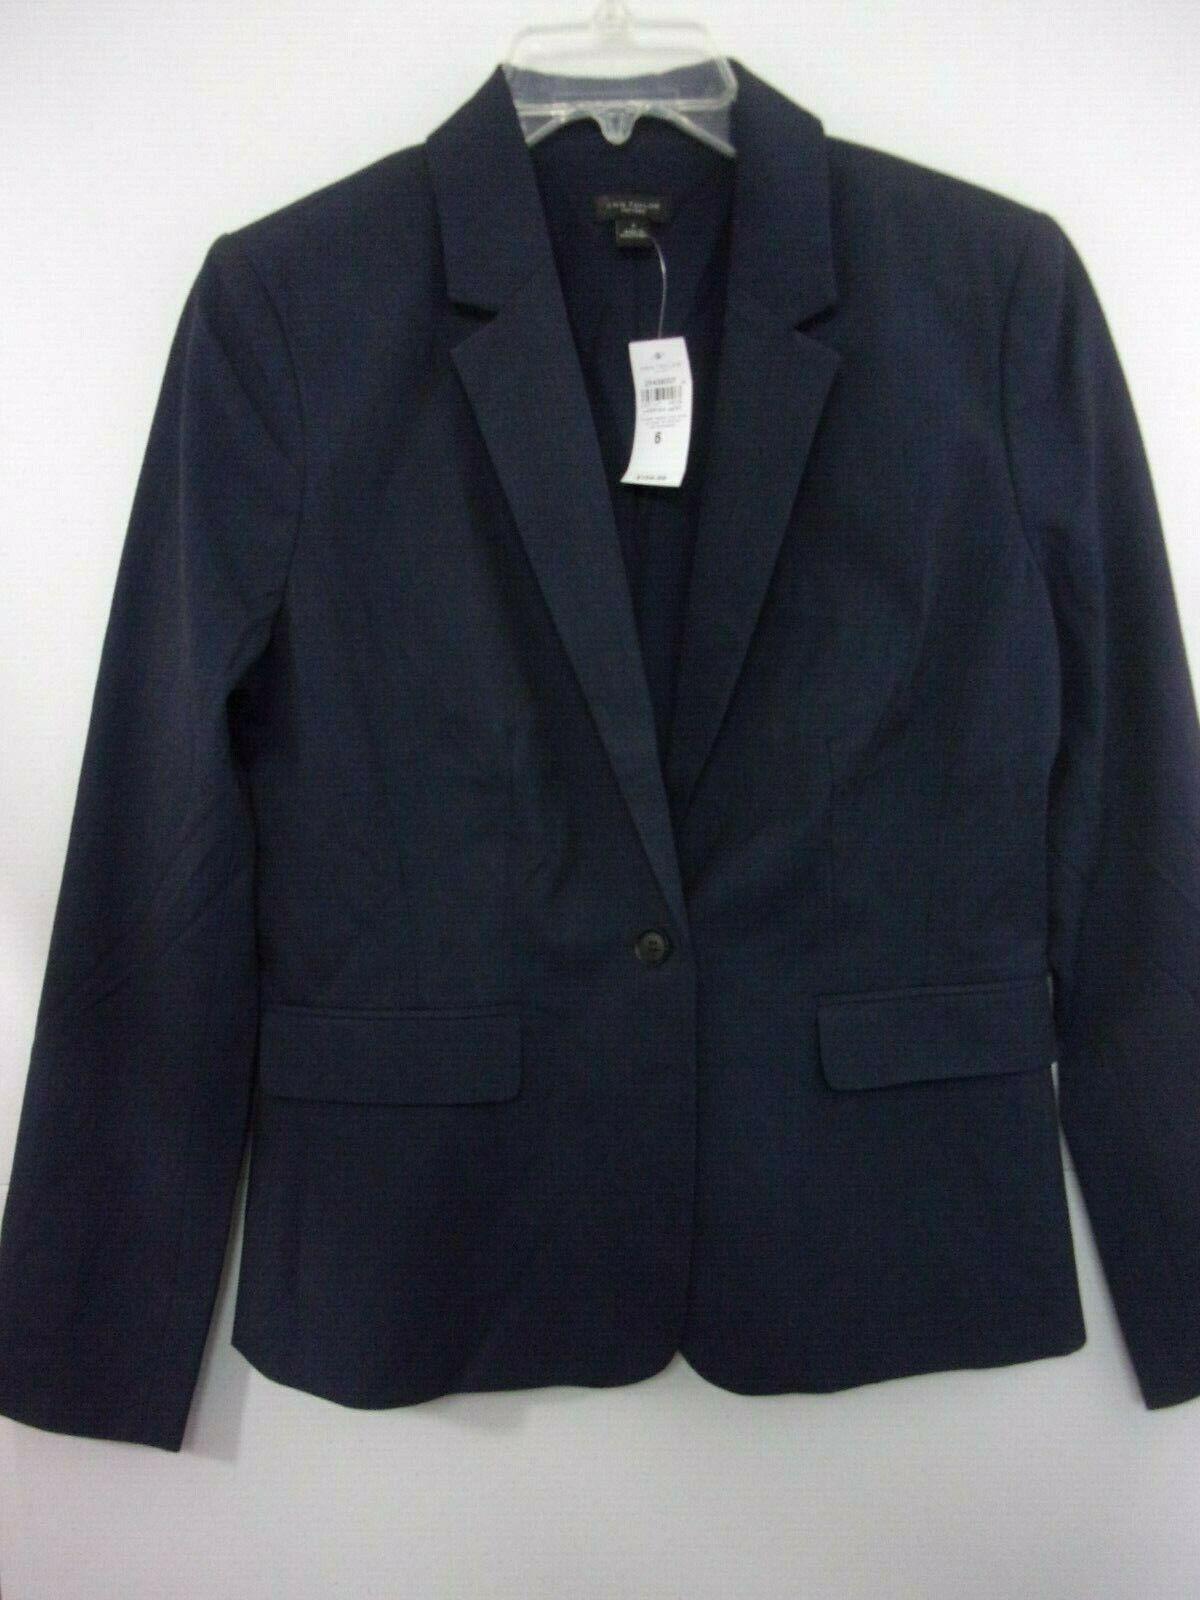 Women's Ann Taylor Factory One Button Blazer in Industrial bluee sz 6 NWT